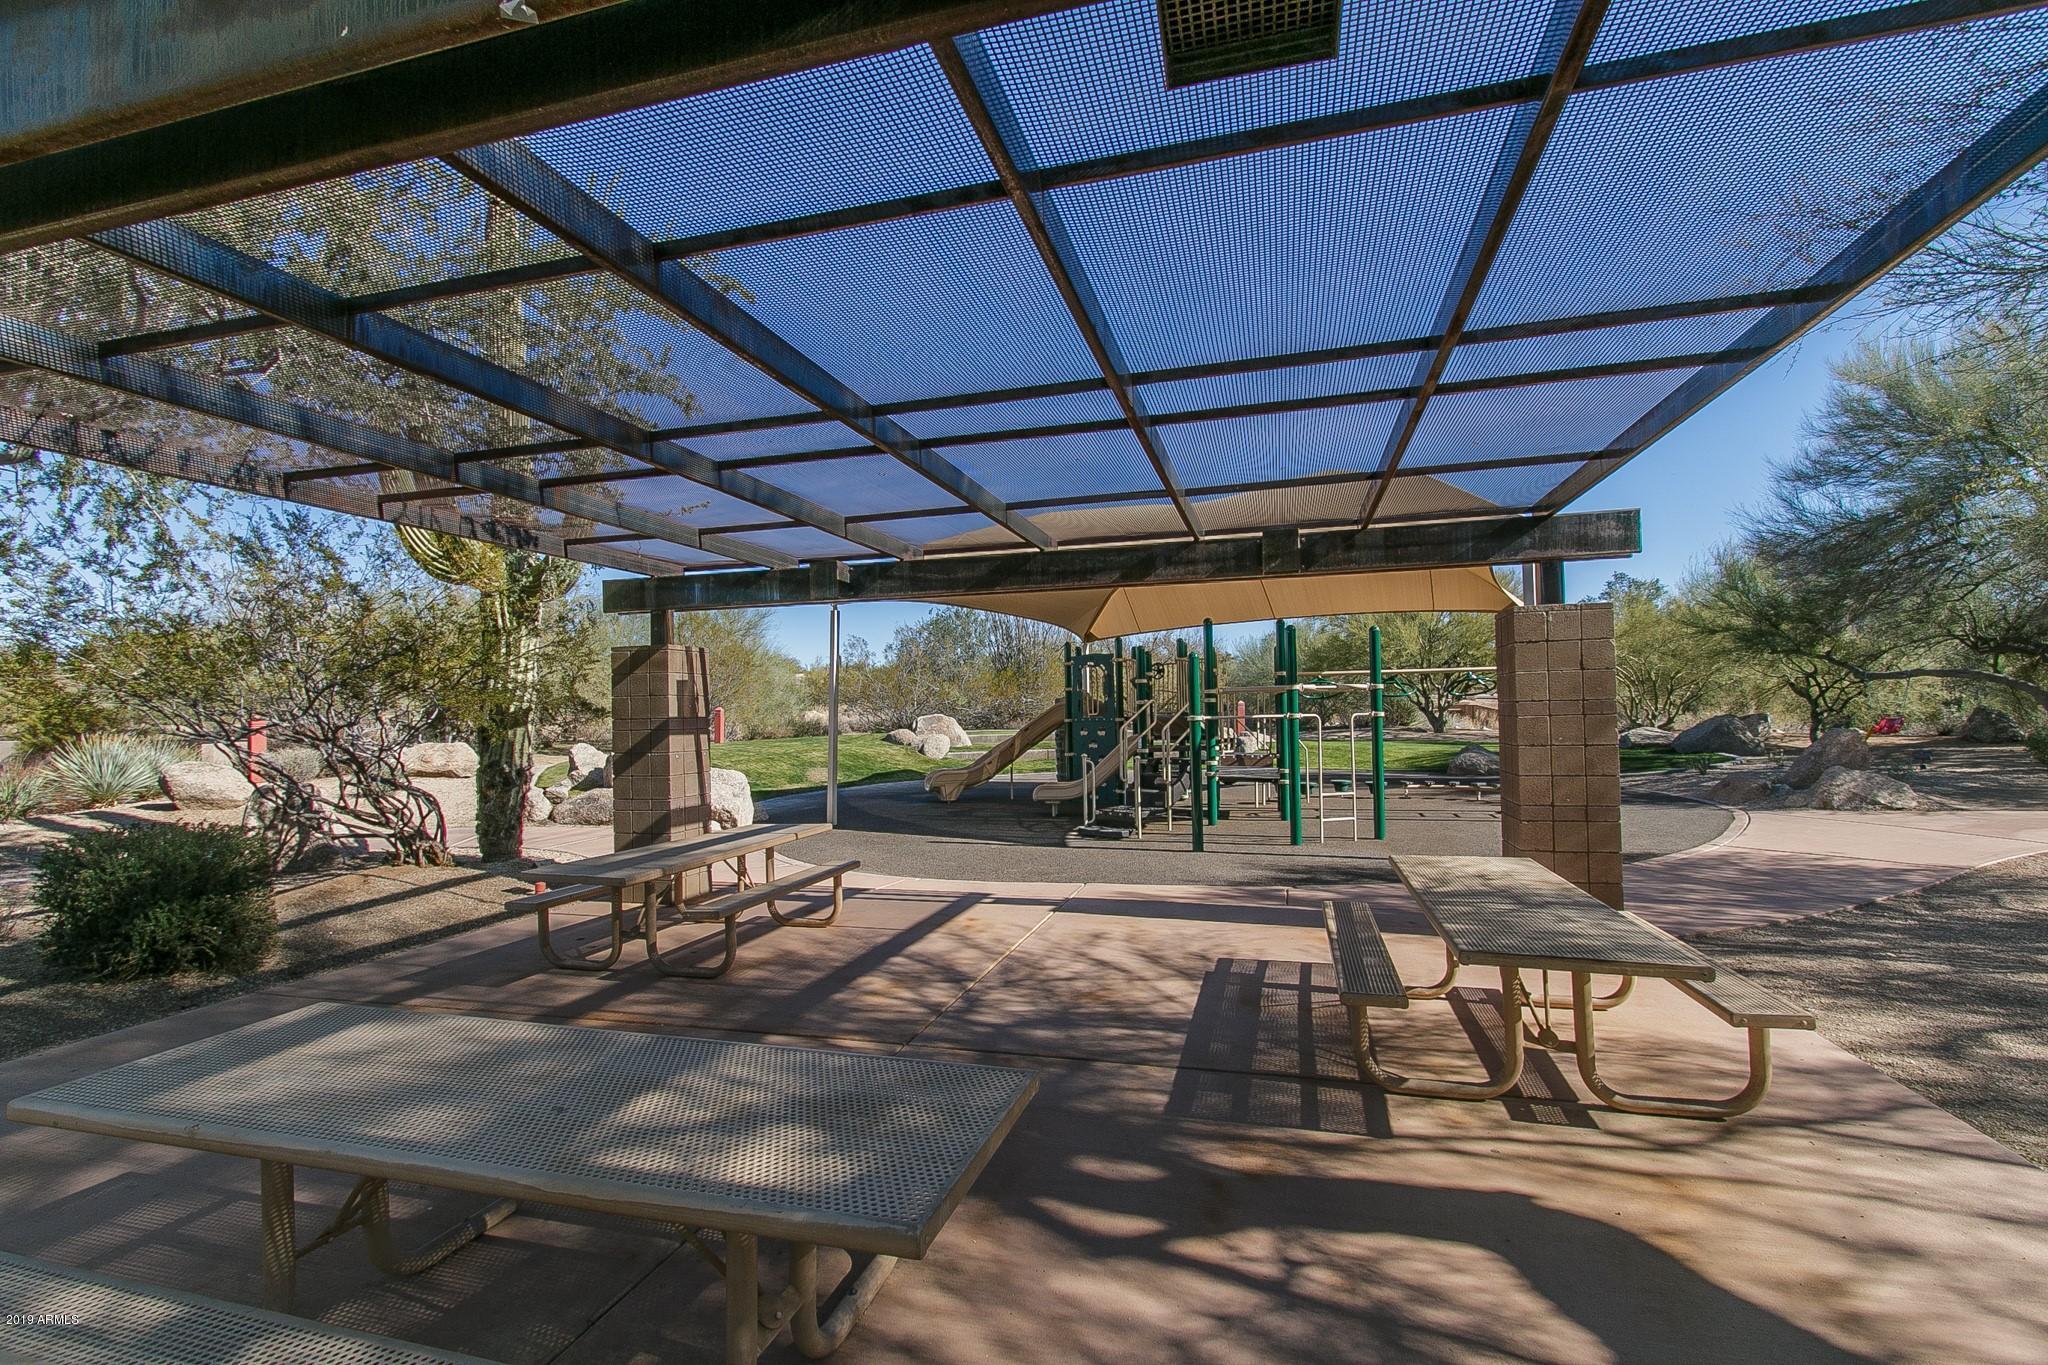 MLS 5879952 28460 N 92ND Place, Scottsdale, AZ 85262 Scottsdale AZ Troon North